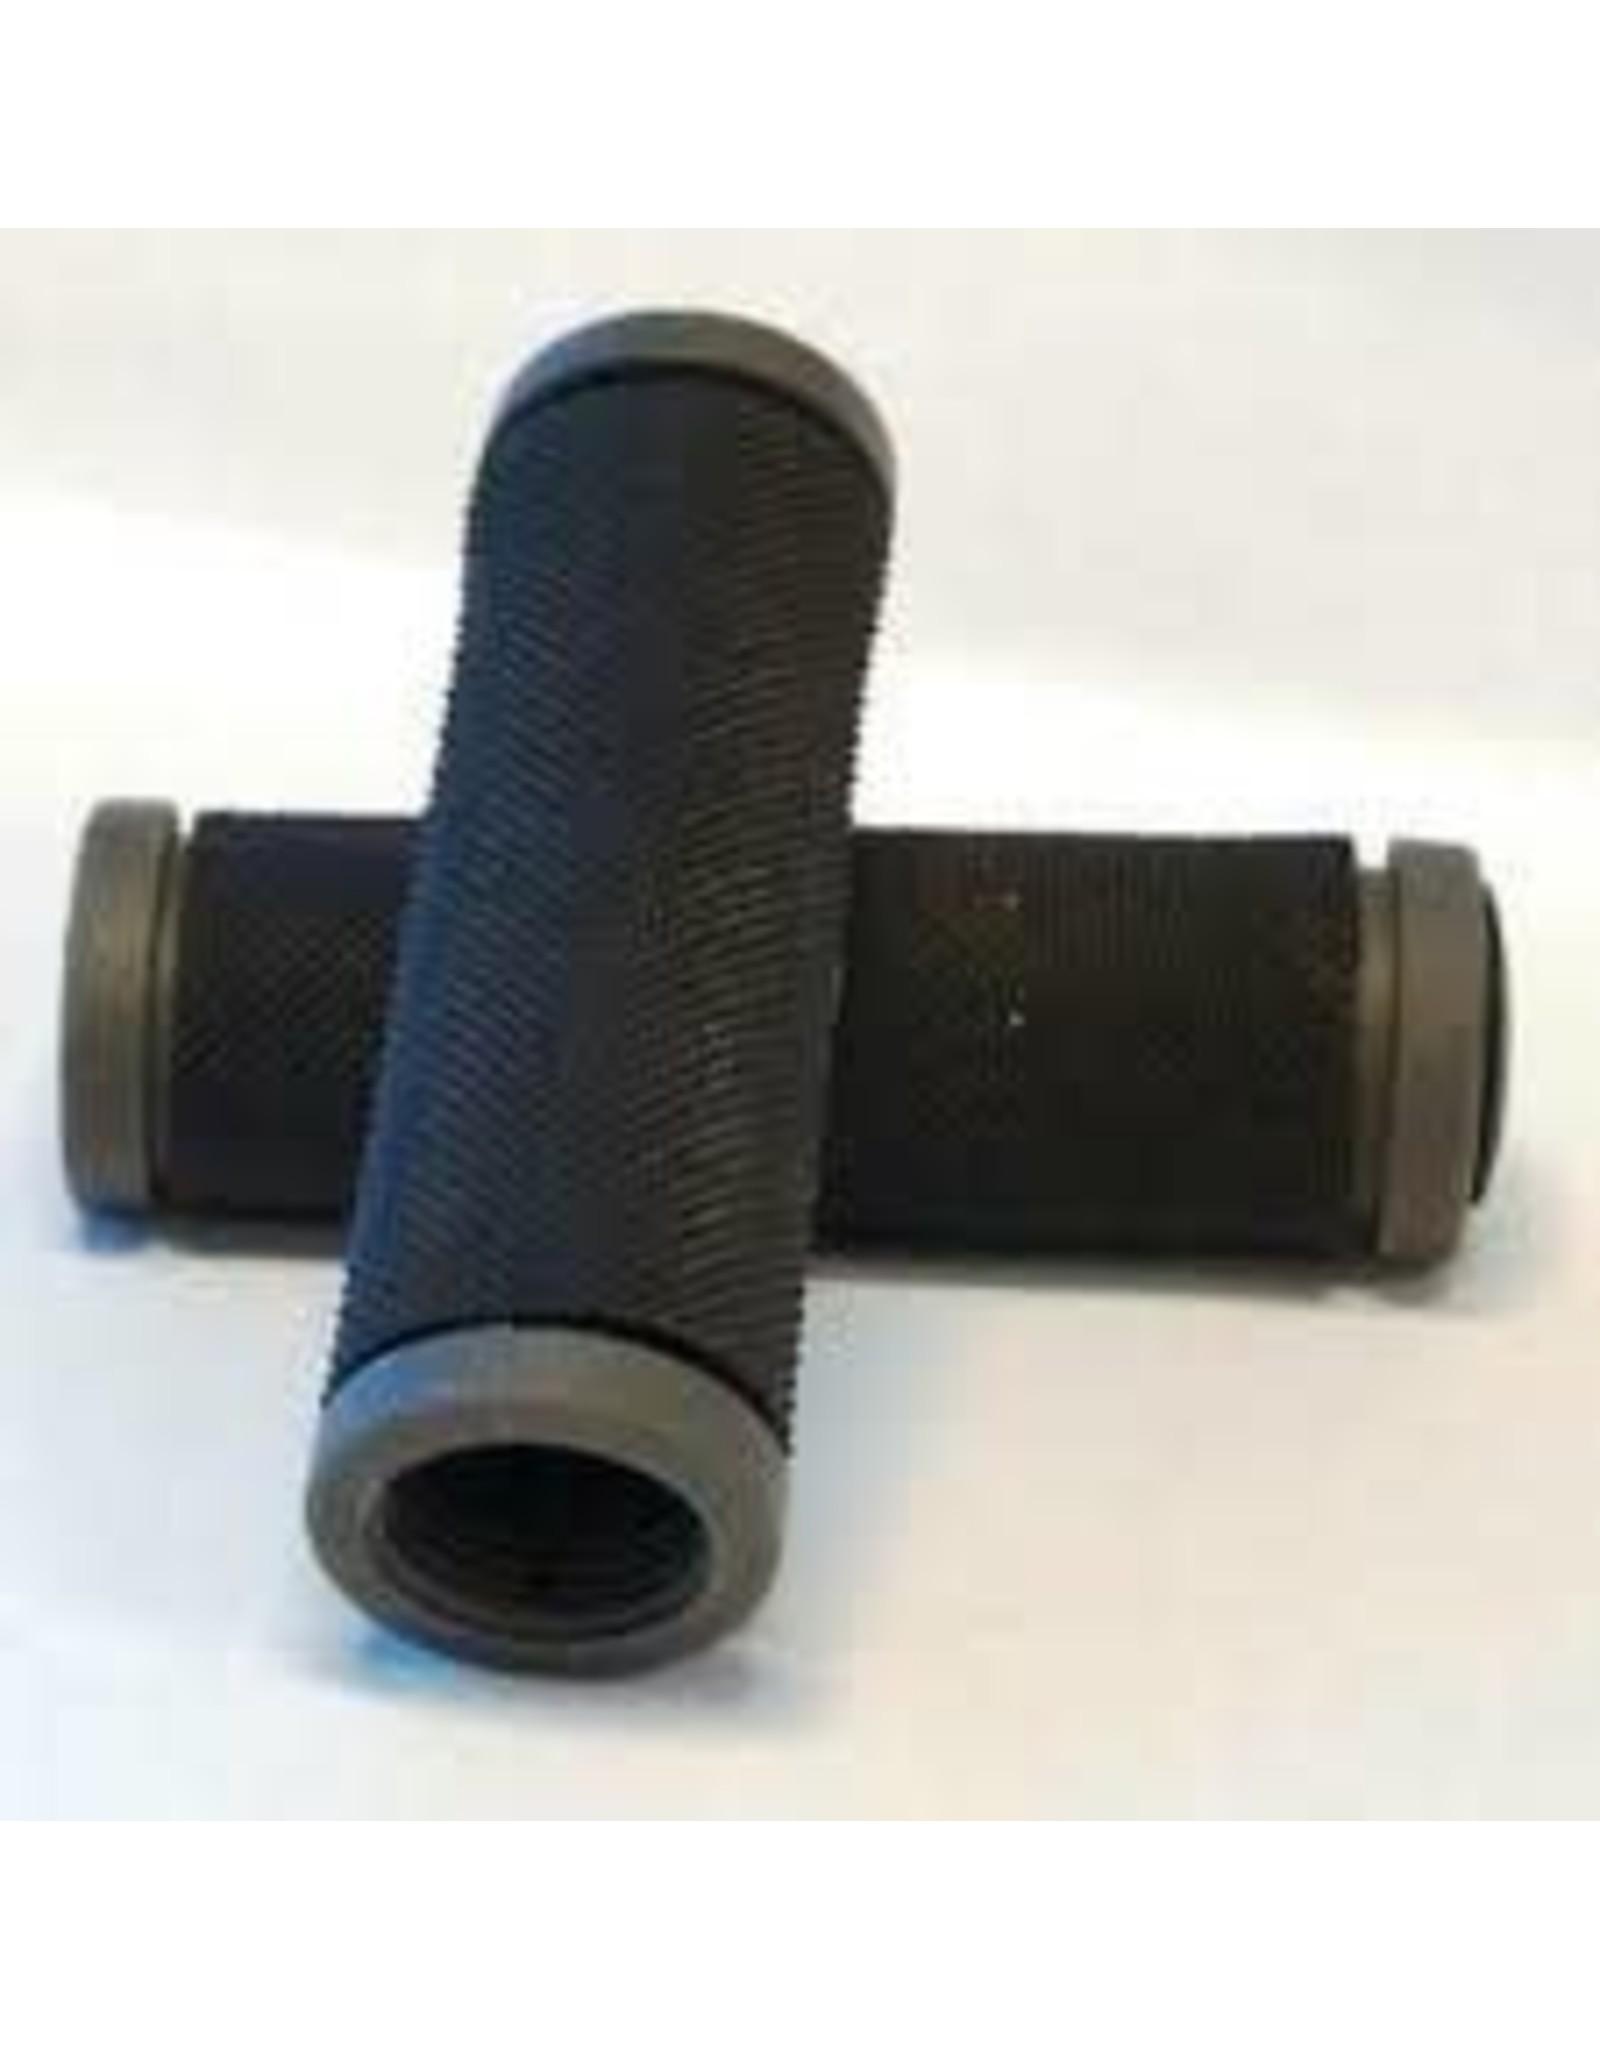 Grip Handlz Endzone 80mm Lock On Black